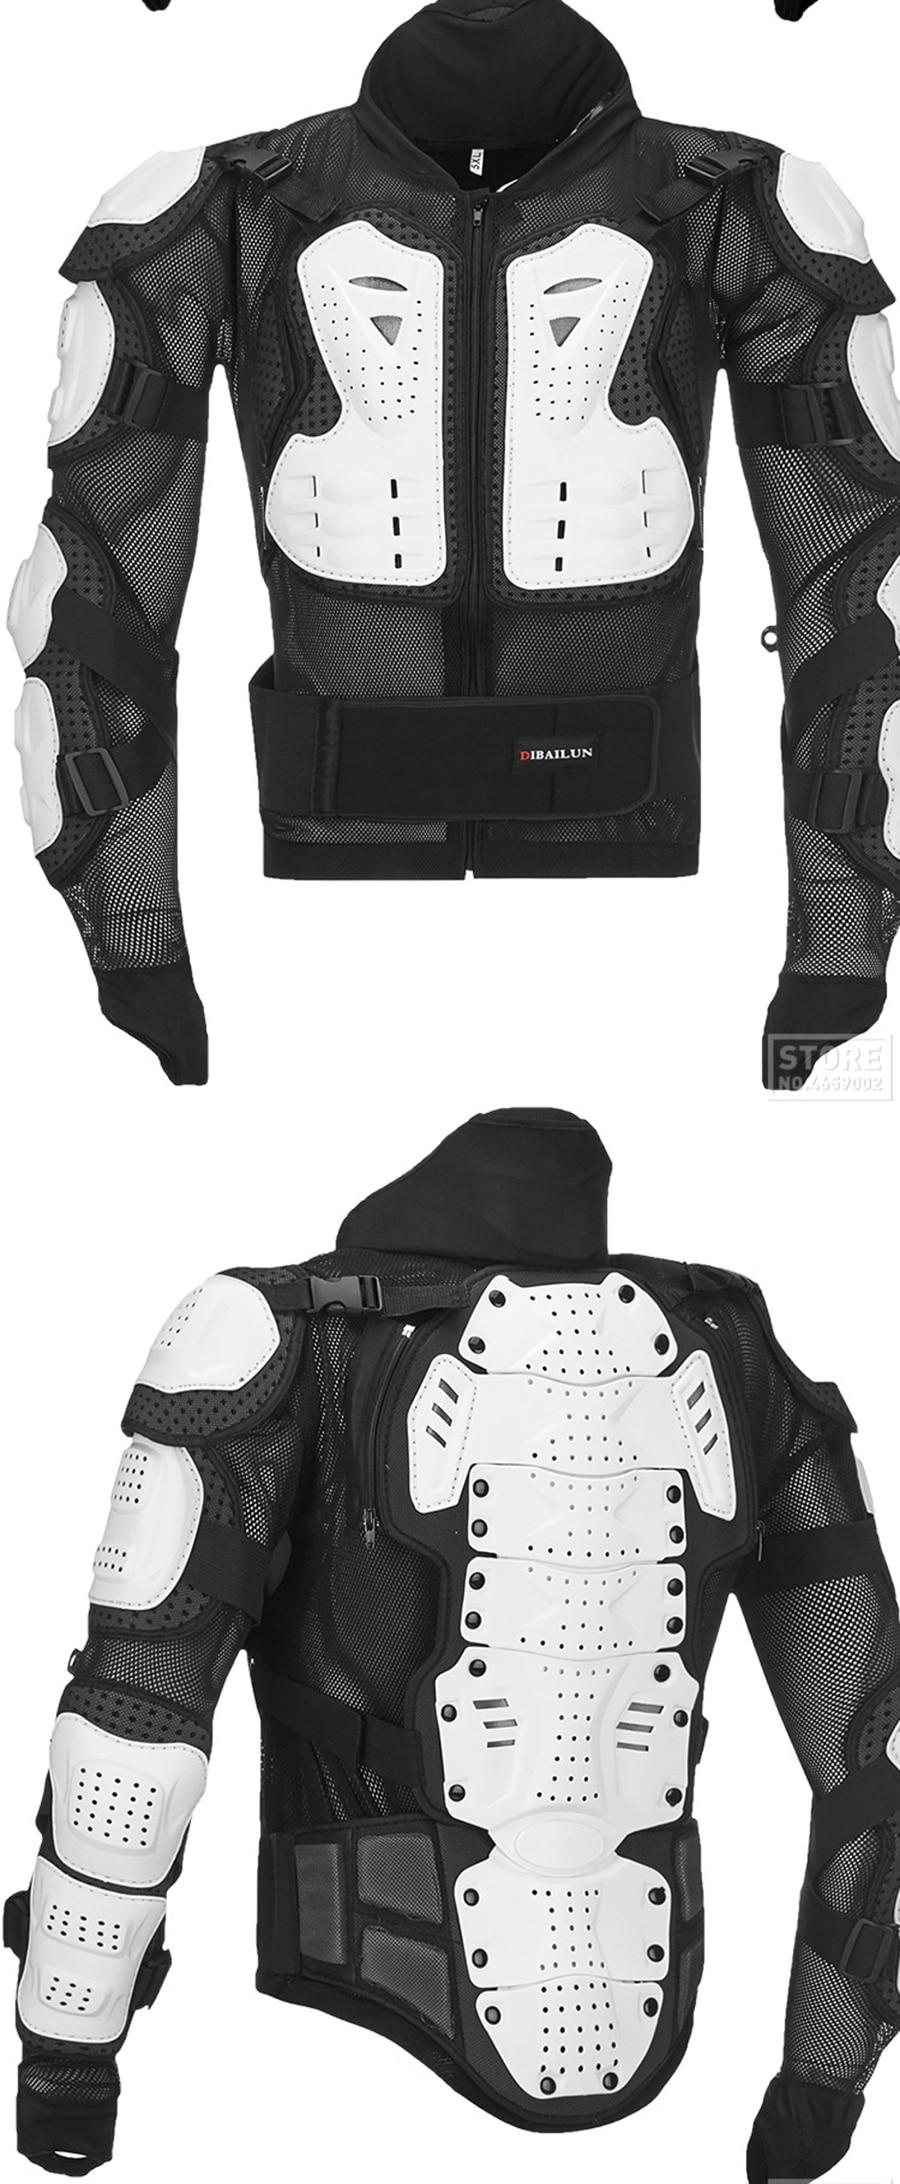 HEROBIKER-Motociclo-Del-Rivestimento-di-Motocross_12